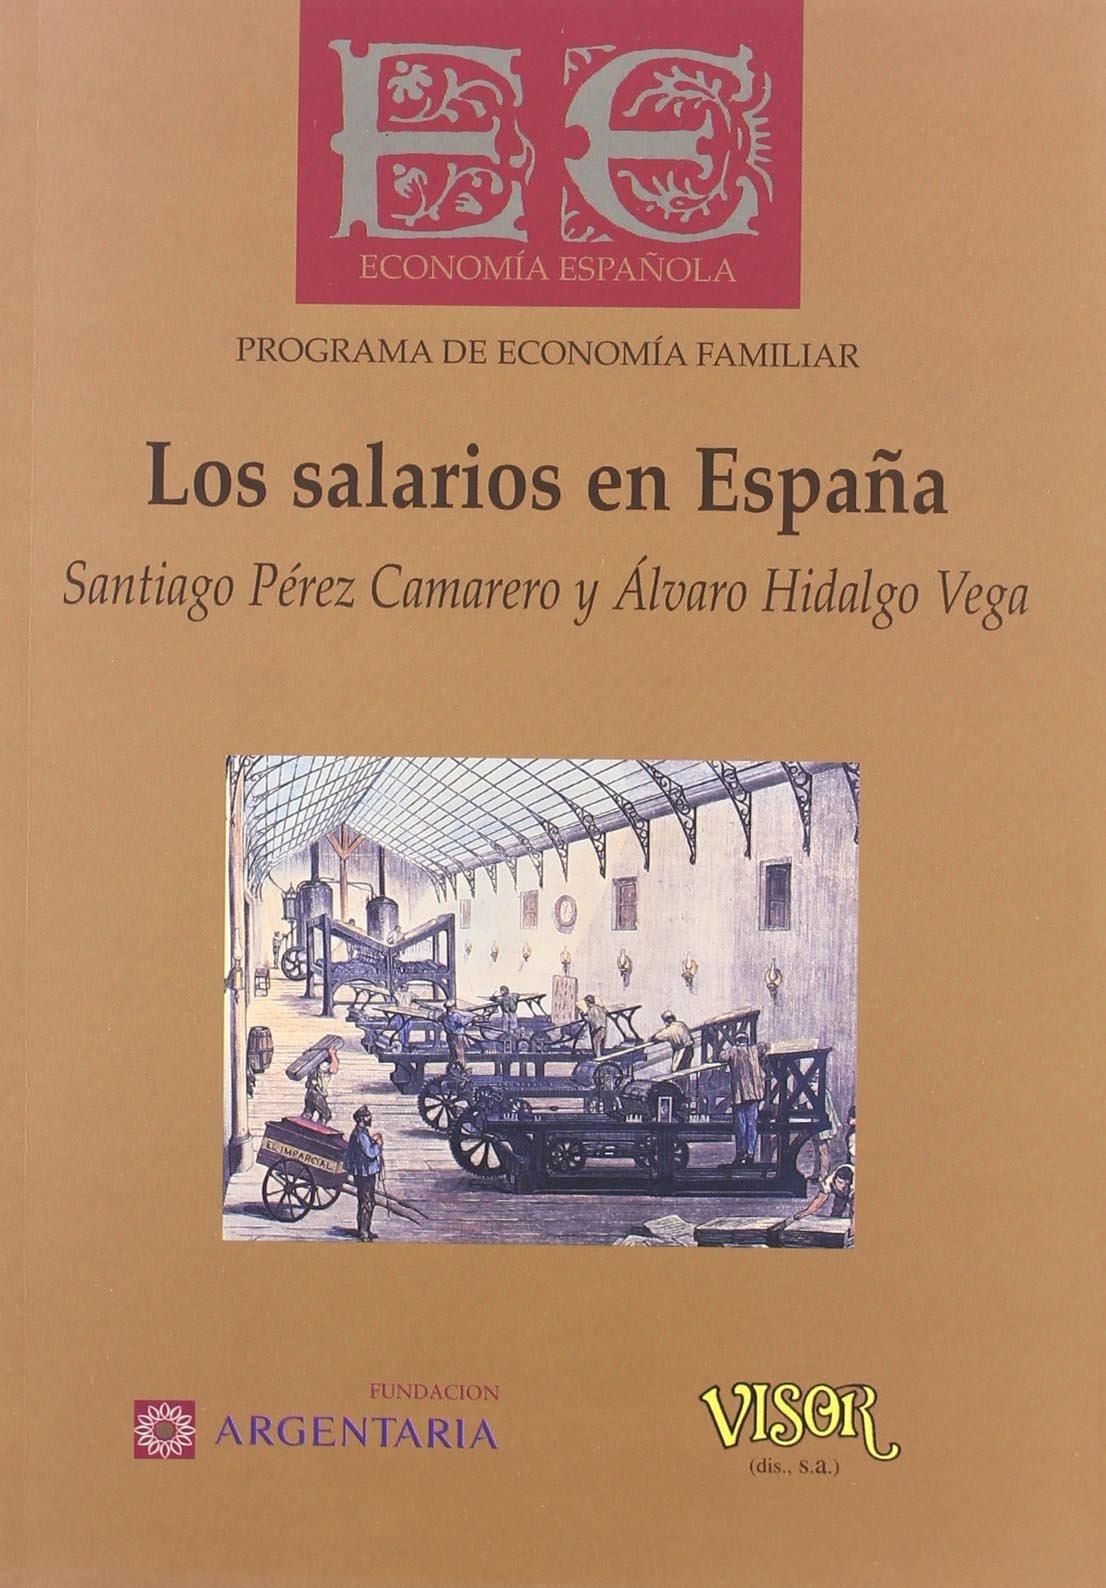 Salarios en España (Colección Economía española): Amazon.es: Pérez Camarero, Santiago: Libros